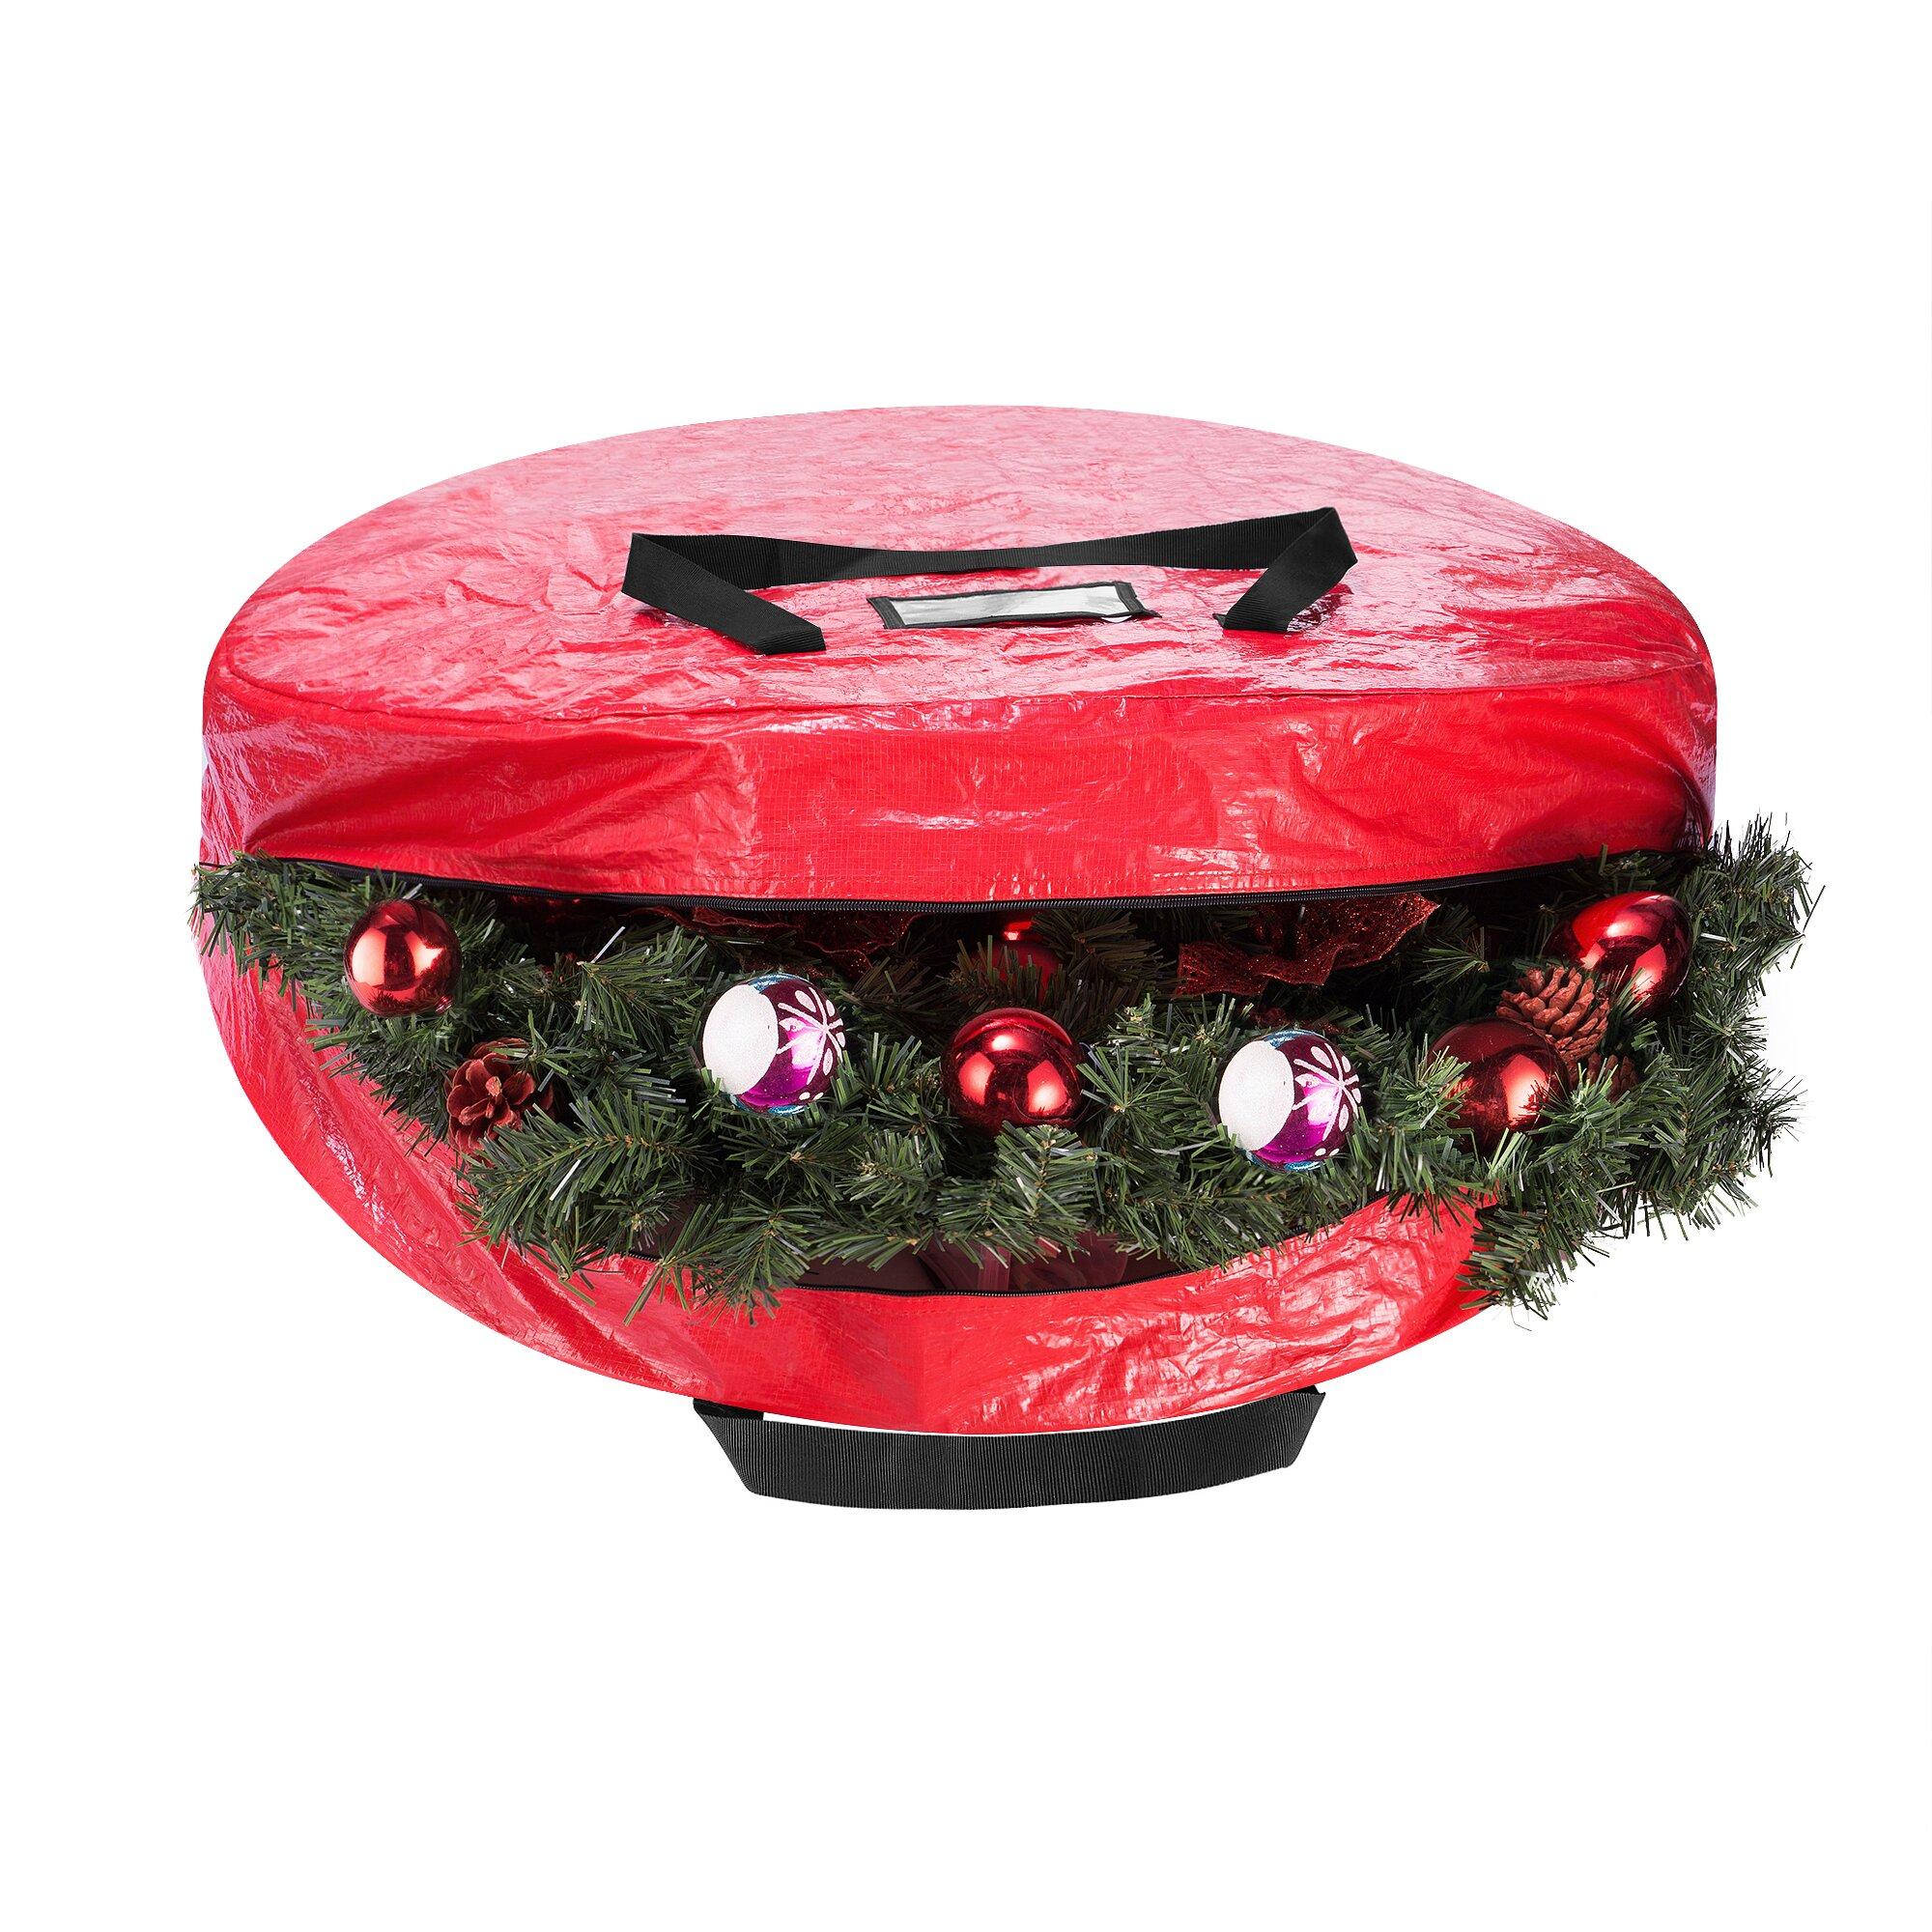 Elf Stor Deluxe Christmas Tree